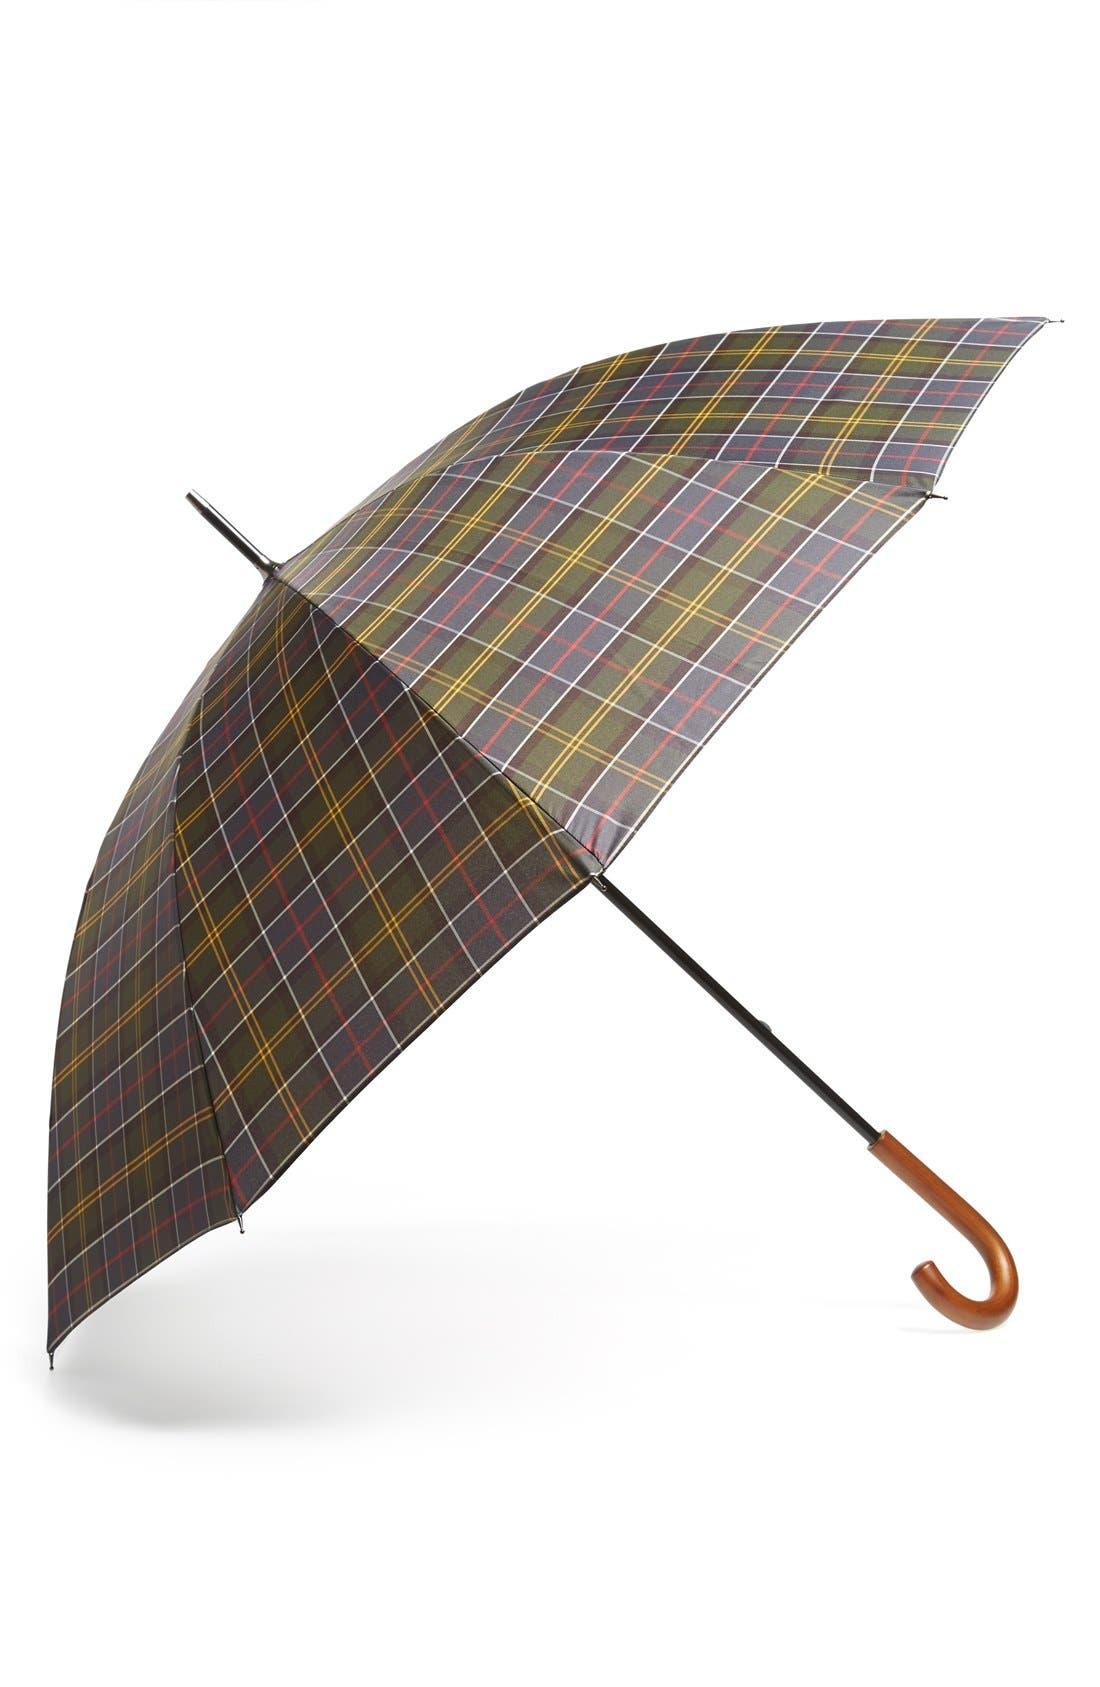 Tartan Golf Umbrella,                             Main thumbnail 1, color,                             300